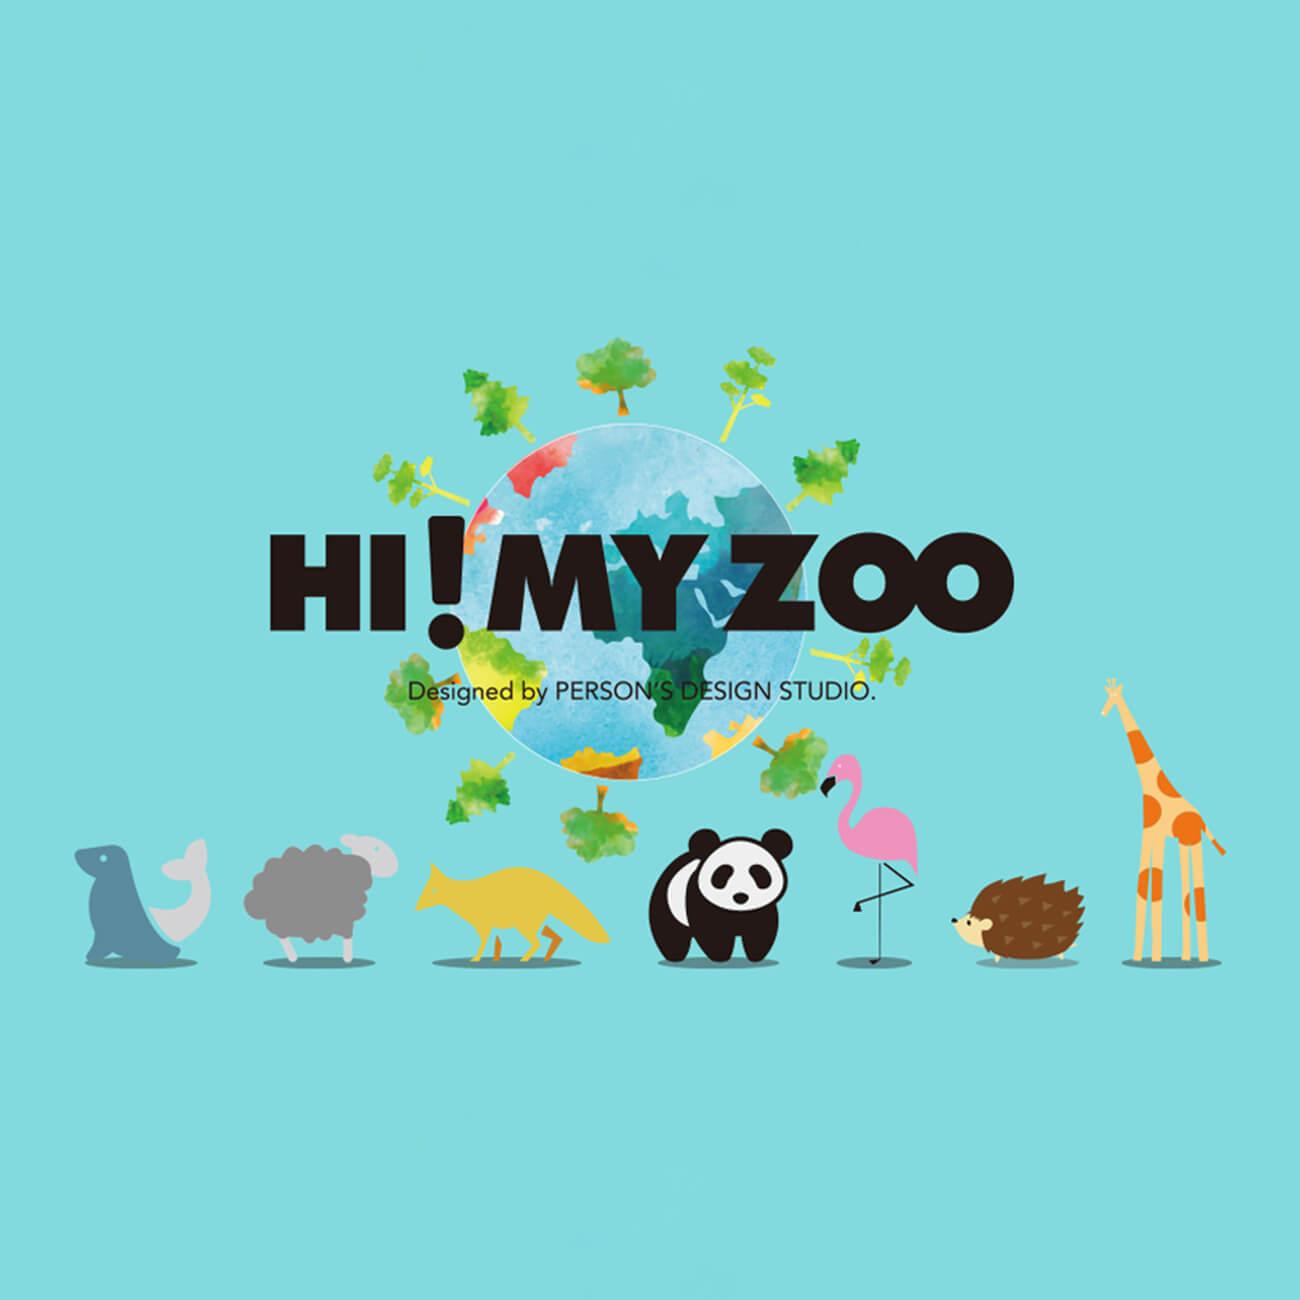 HI! MY ZOO(ハイマイズー)